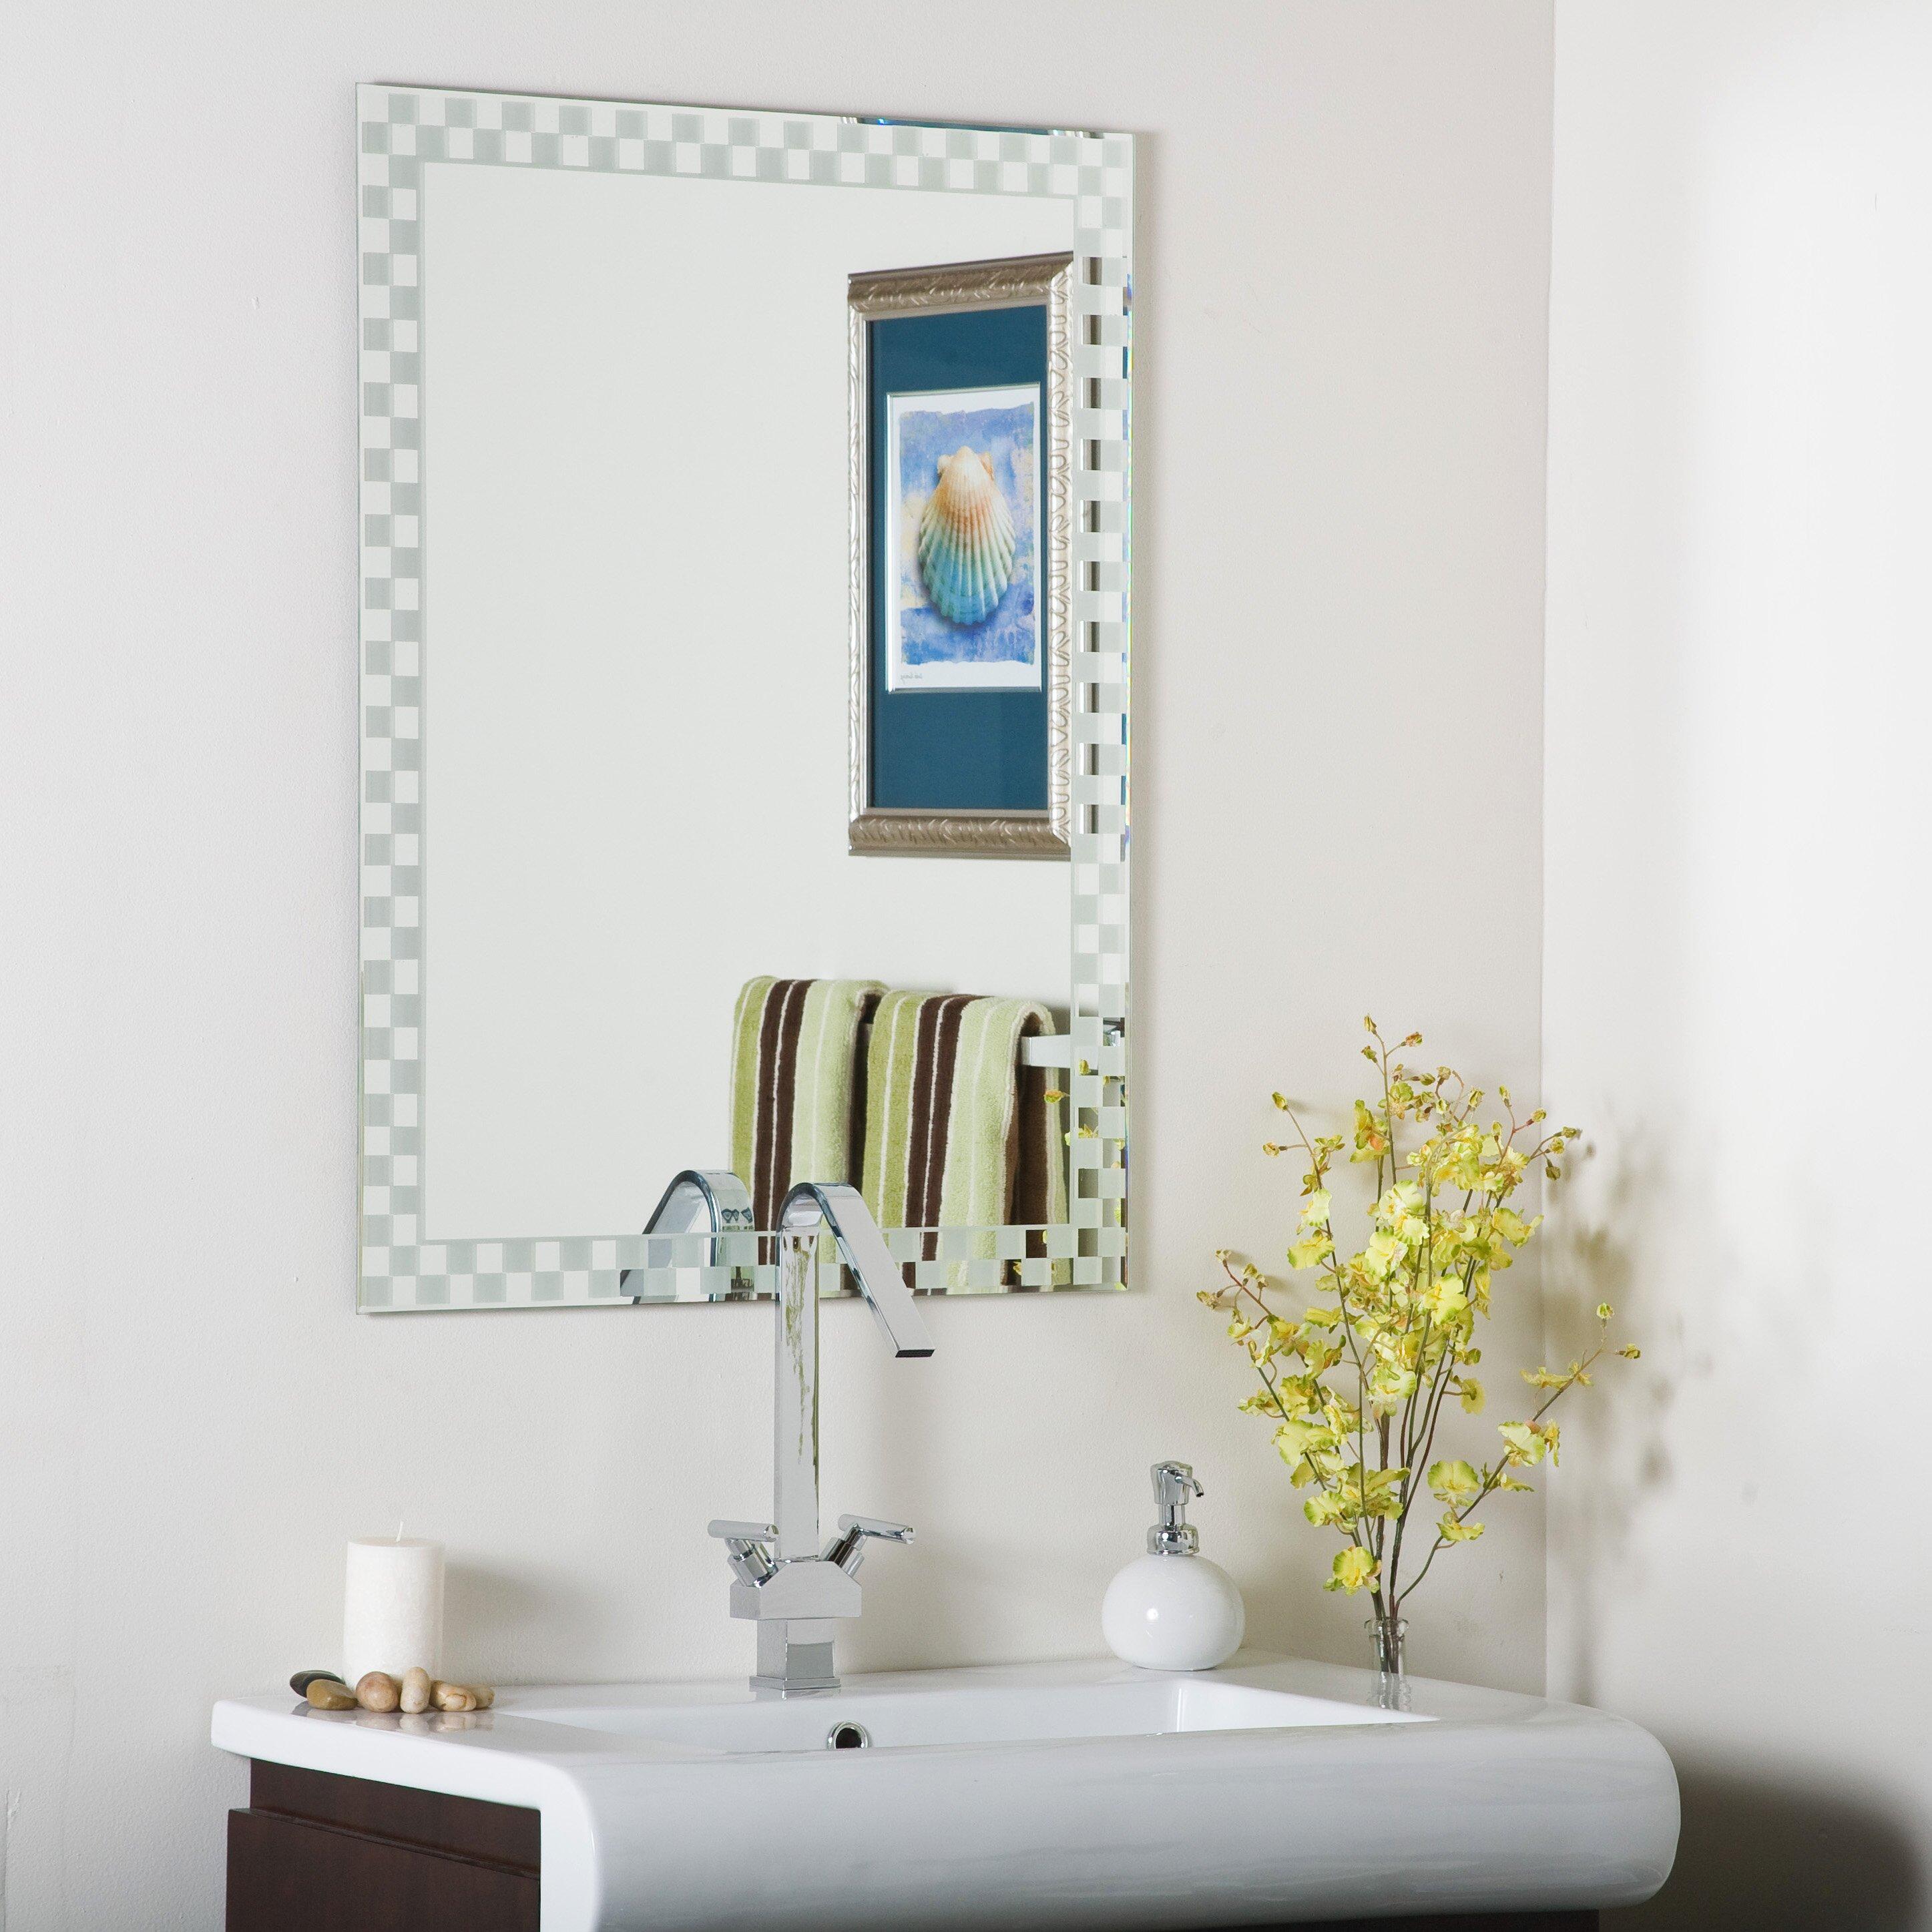 decor wonderland frameless liana wall mirror reviews wayfair. Black Bedroom Furniture Sets. Home Design Ideas